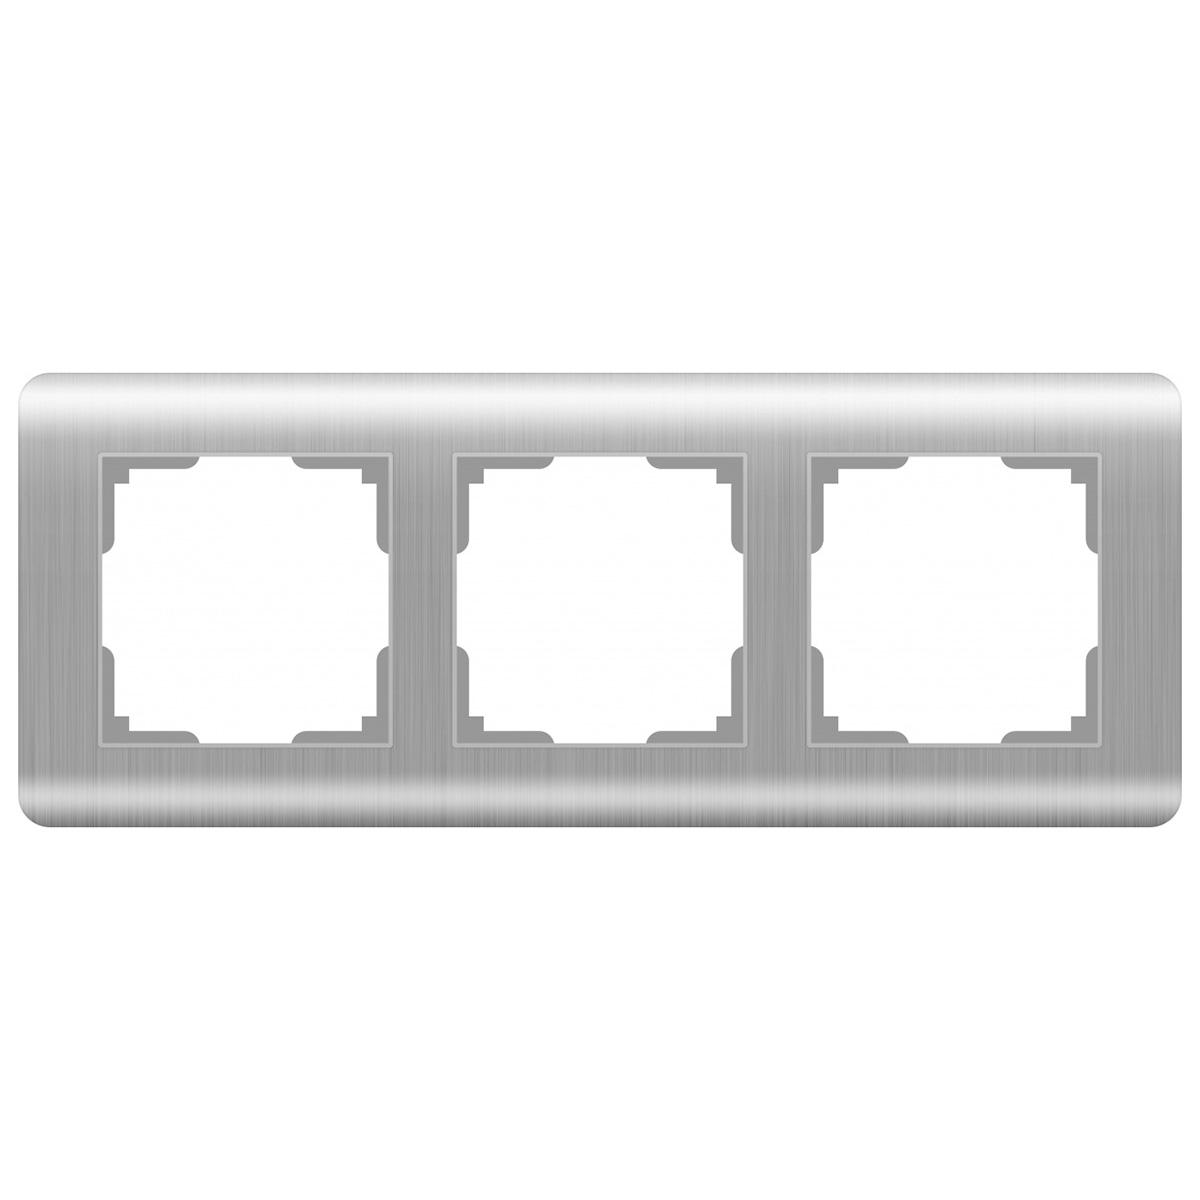 цена Рамка Stream на 3 поста серебряный WL12-Frame-03 4690389076381 онлайн в 2017 году